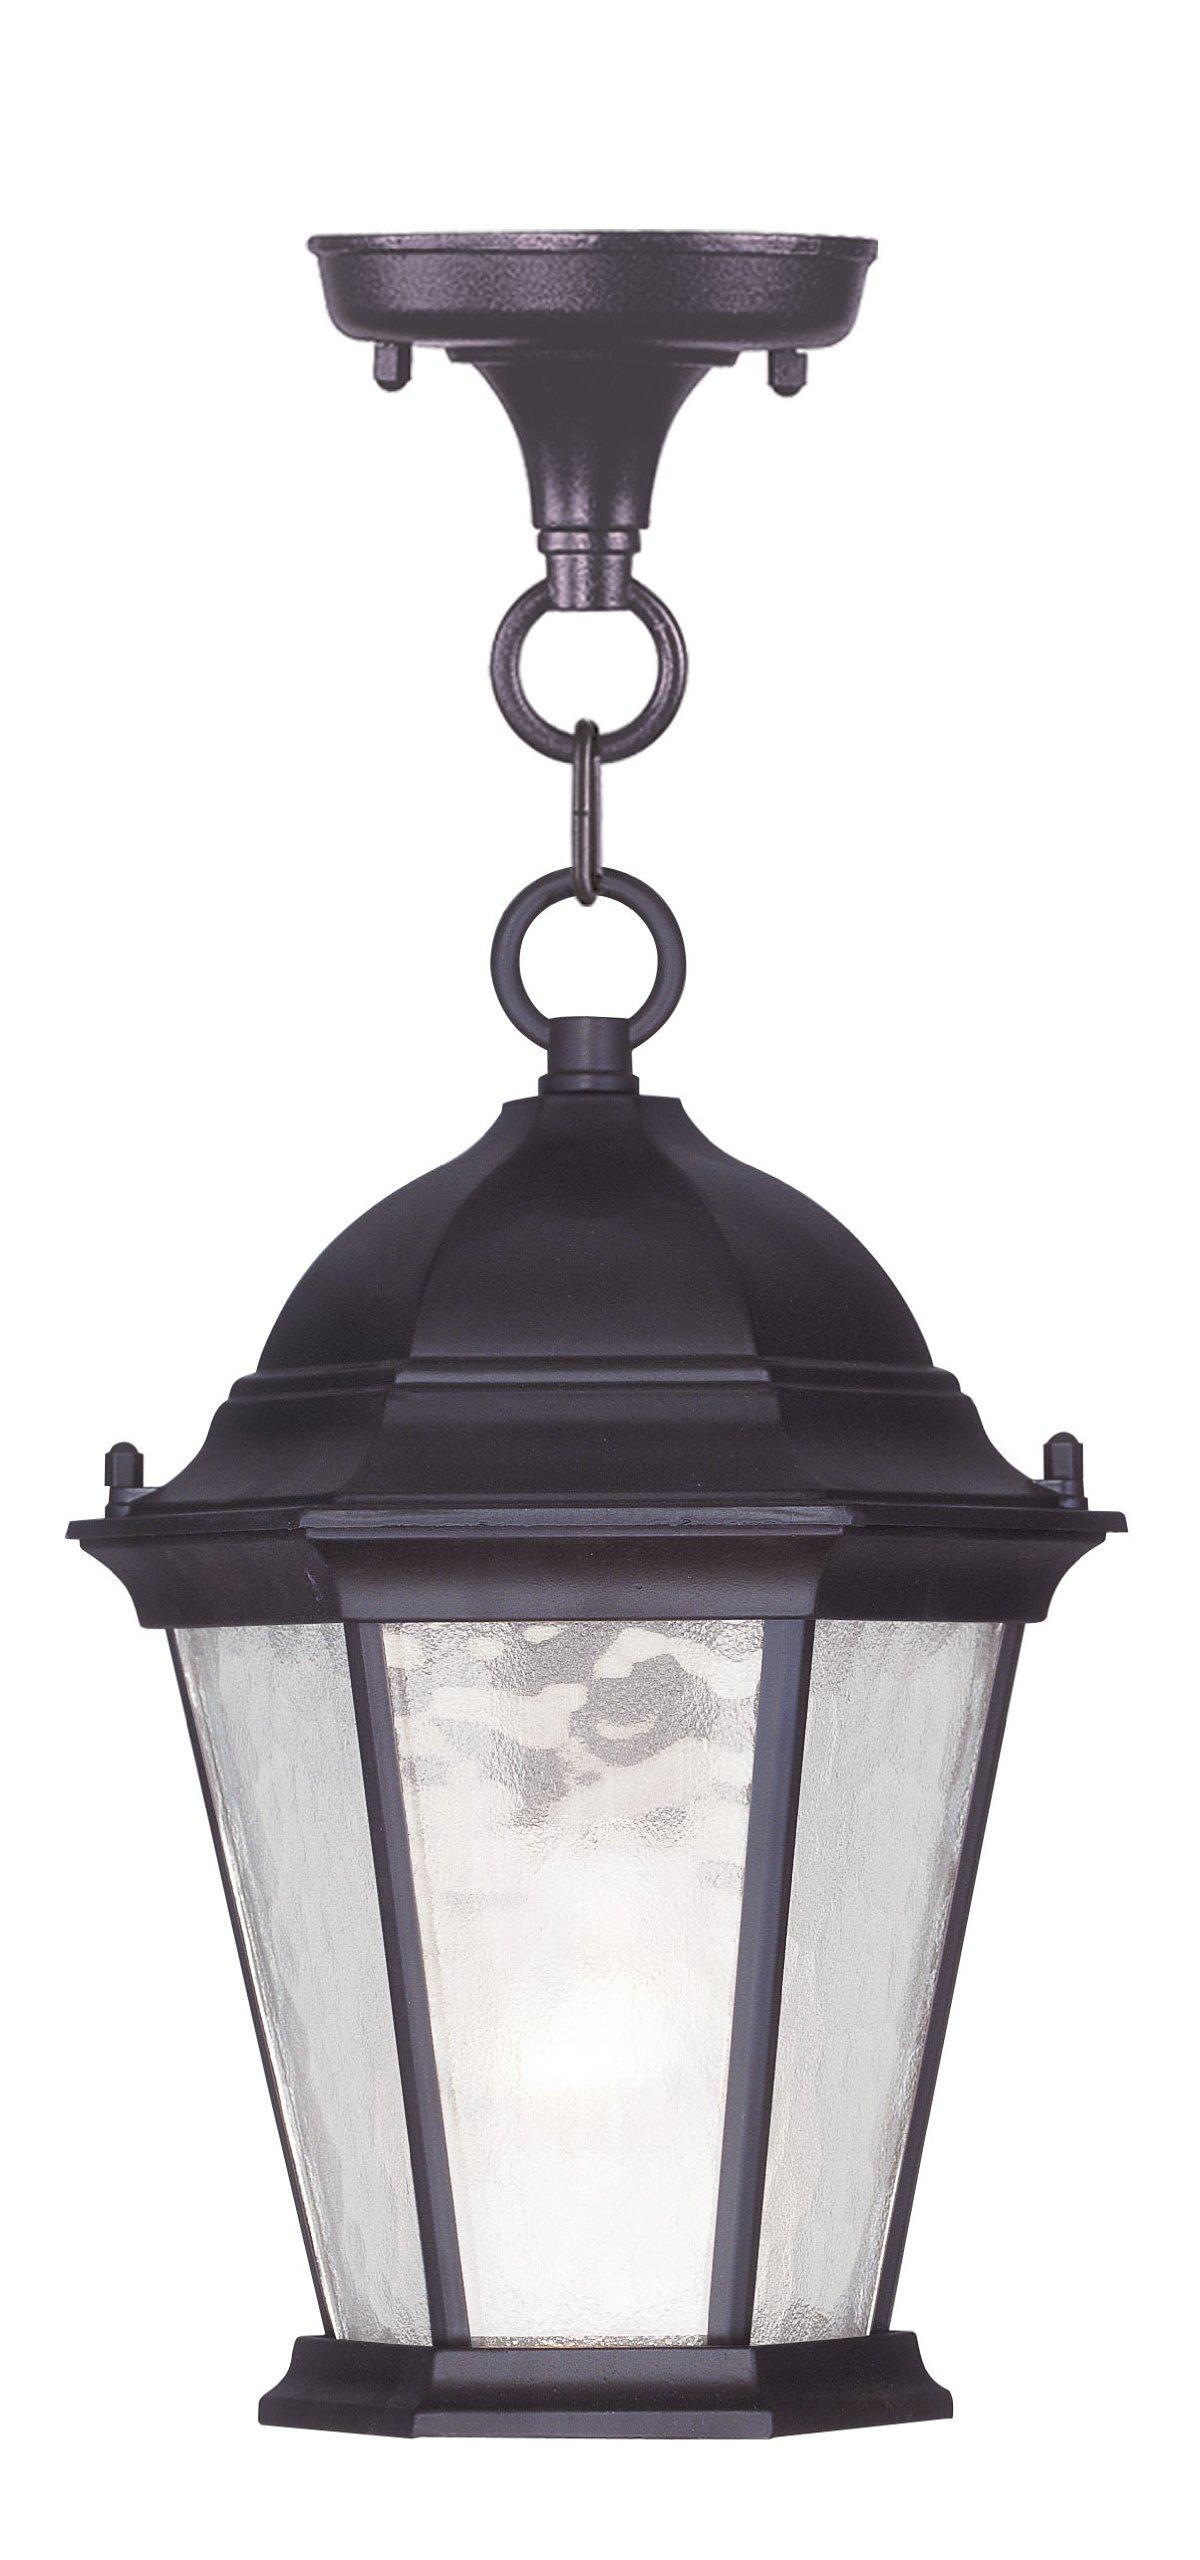 Livex Lighting 7559-07 Hamilton 1 Light Outdoor Hanging Lantern, Bronze